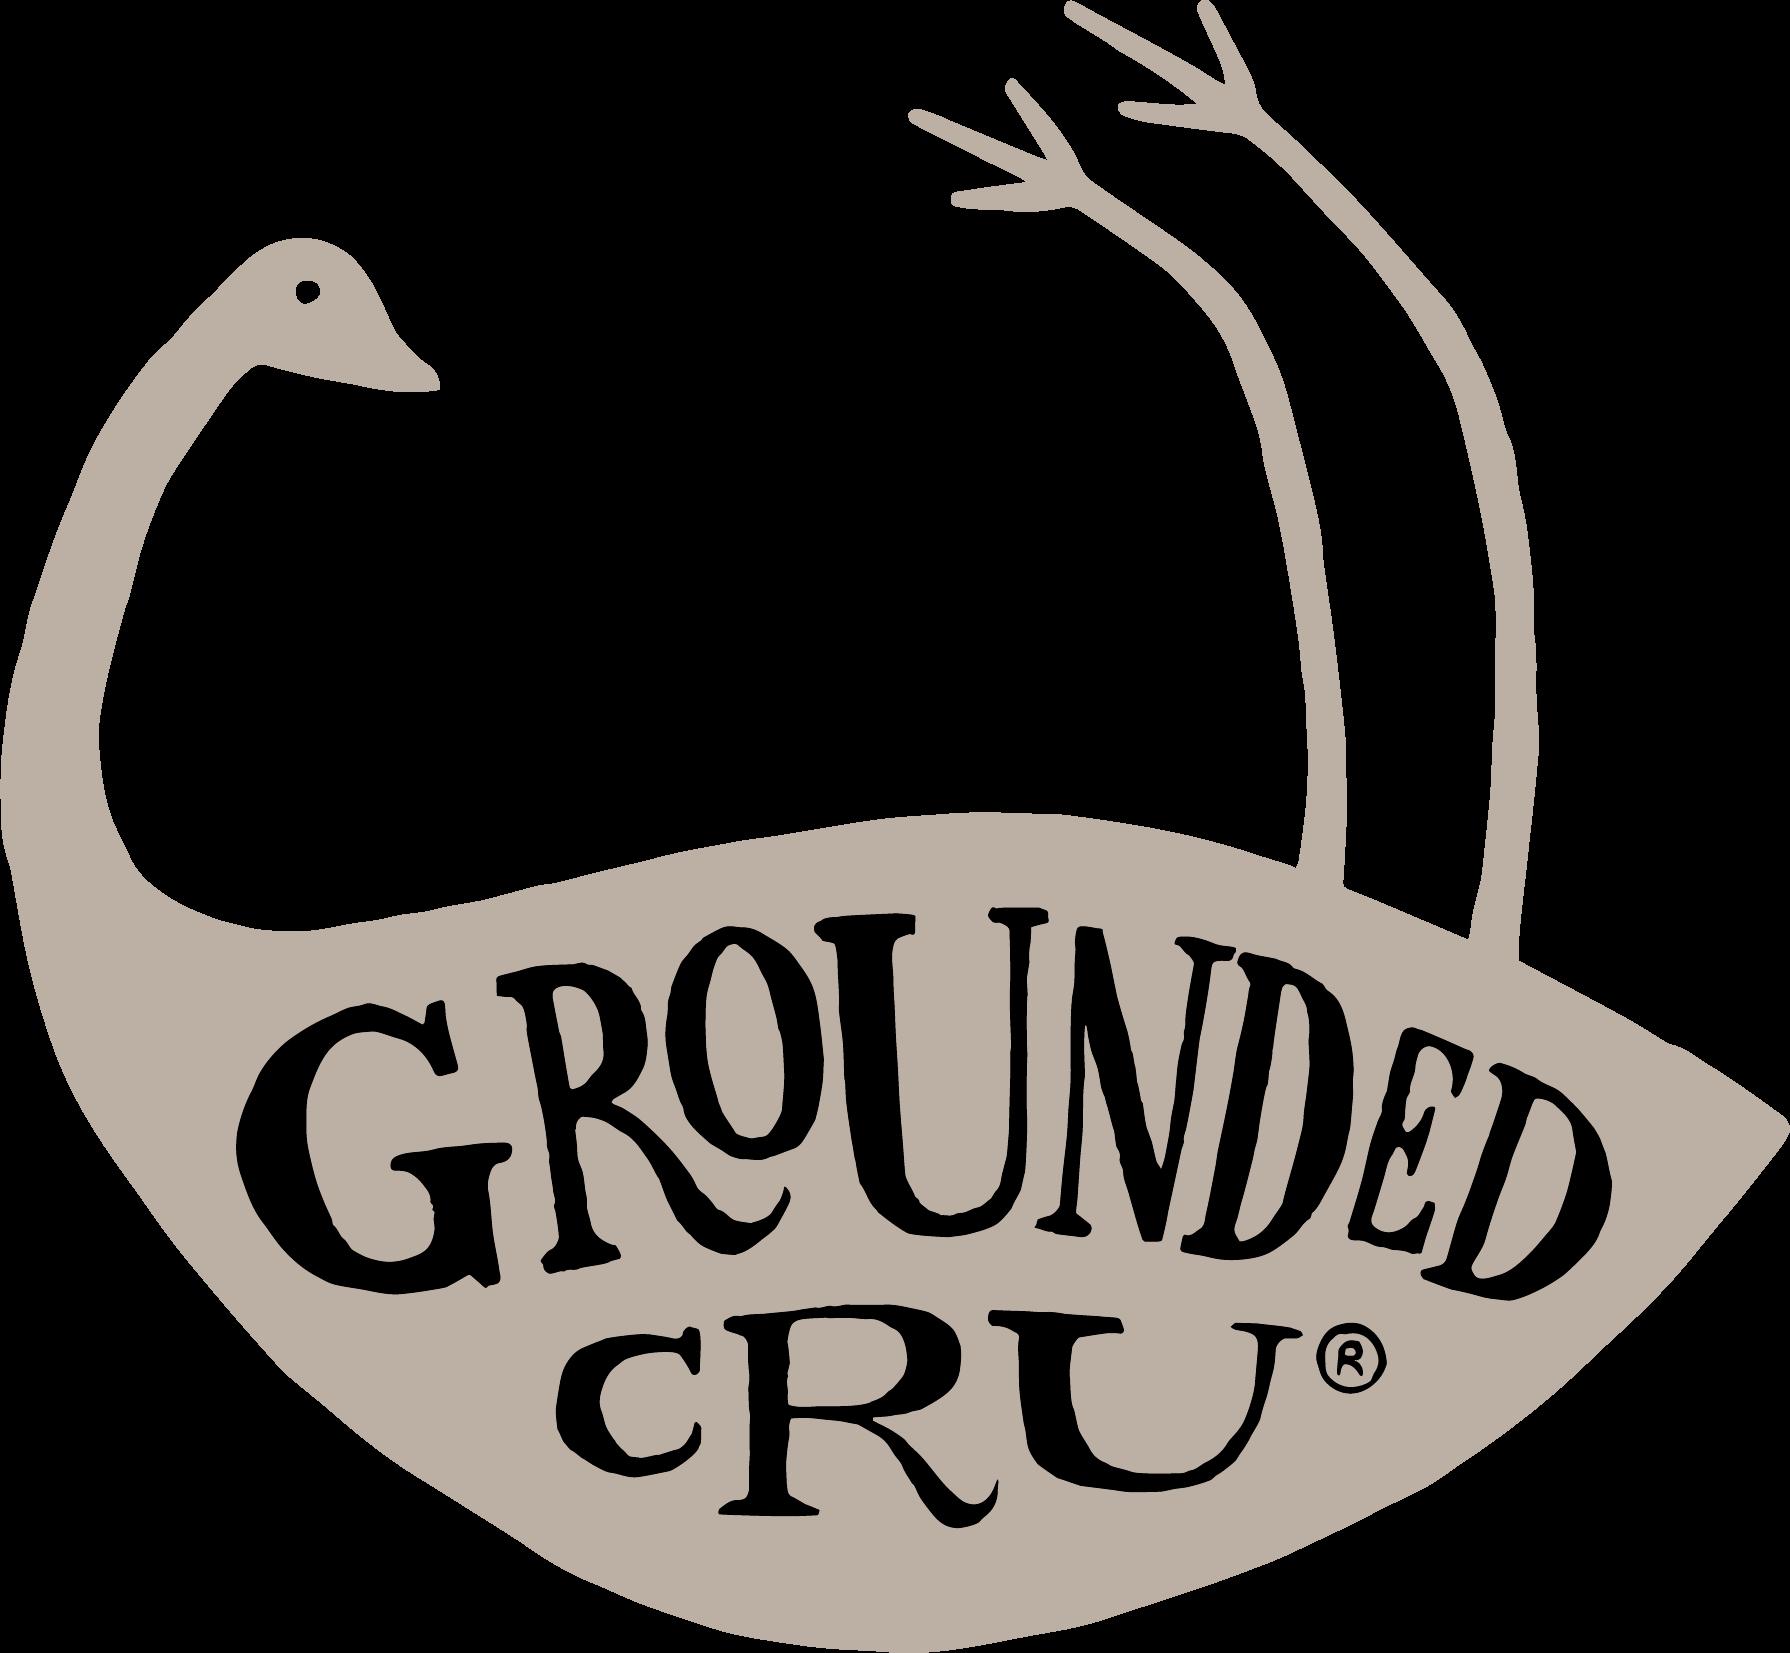 Image: Grounded Cru